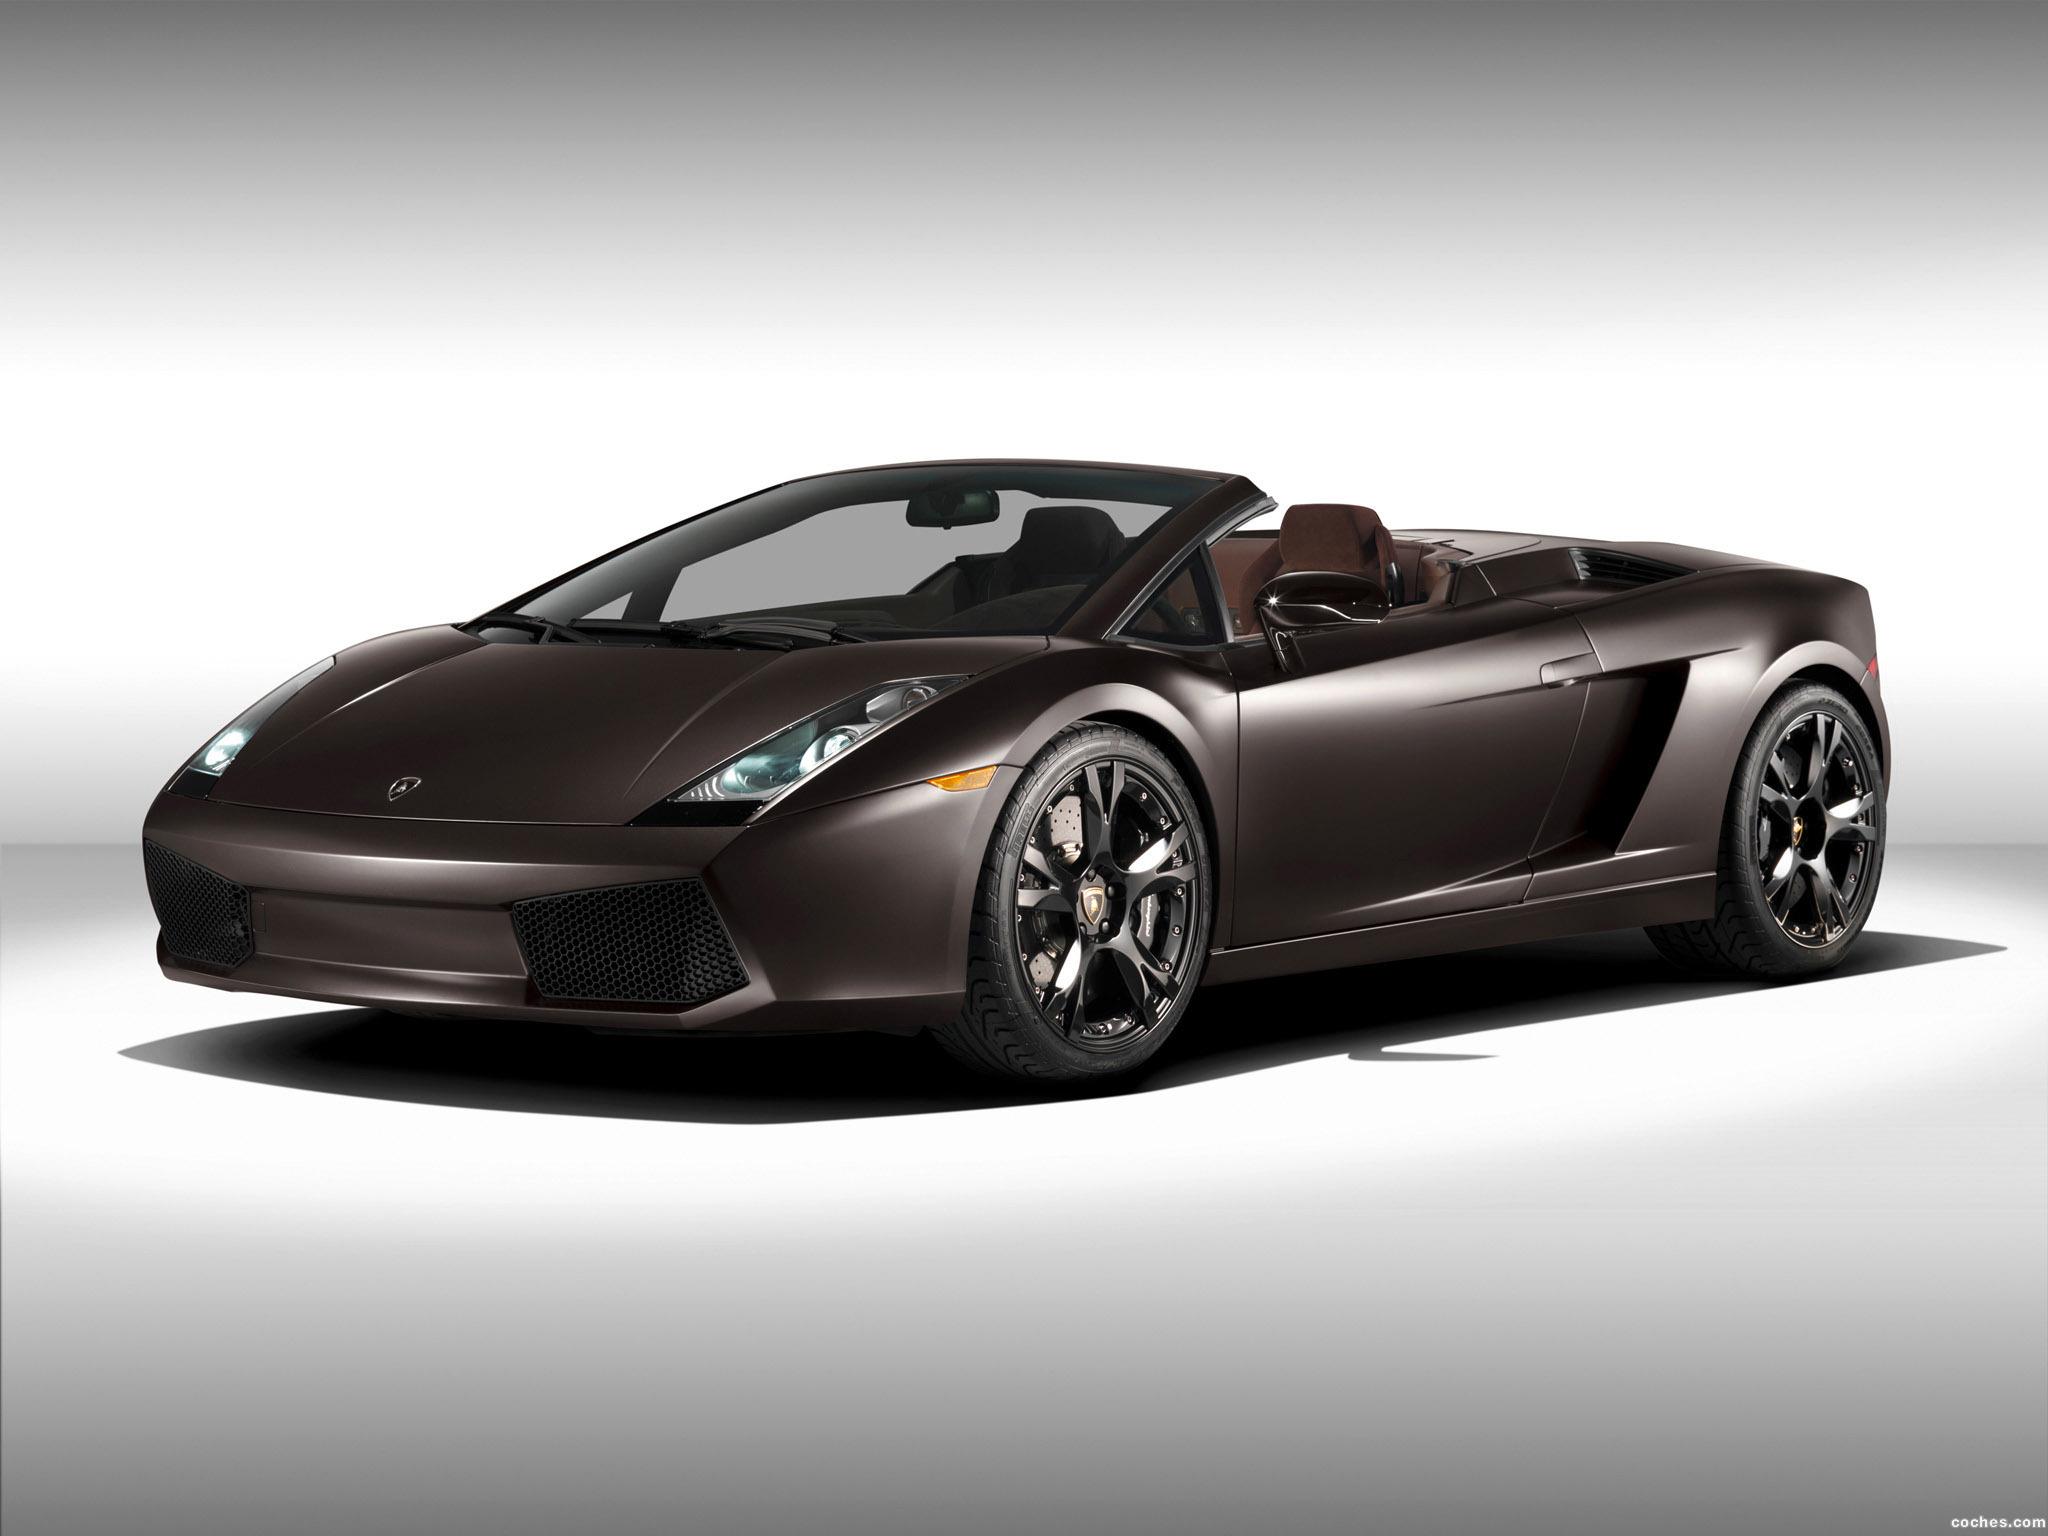 Foto 0 de Lamborghini Gallardo Spyder AD Personam 2008